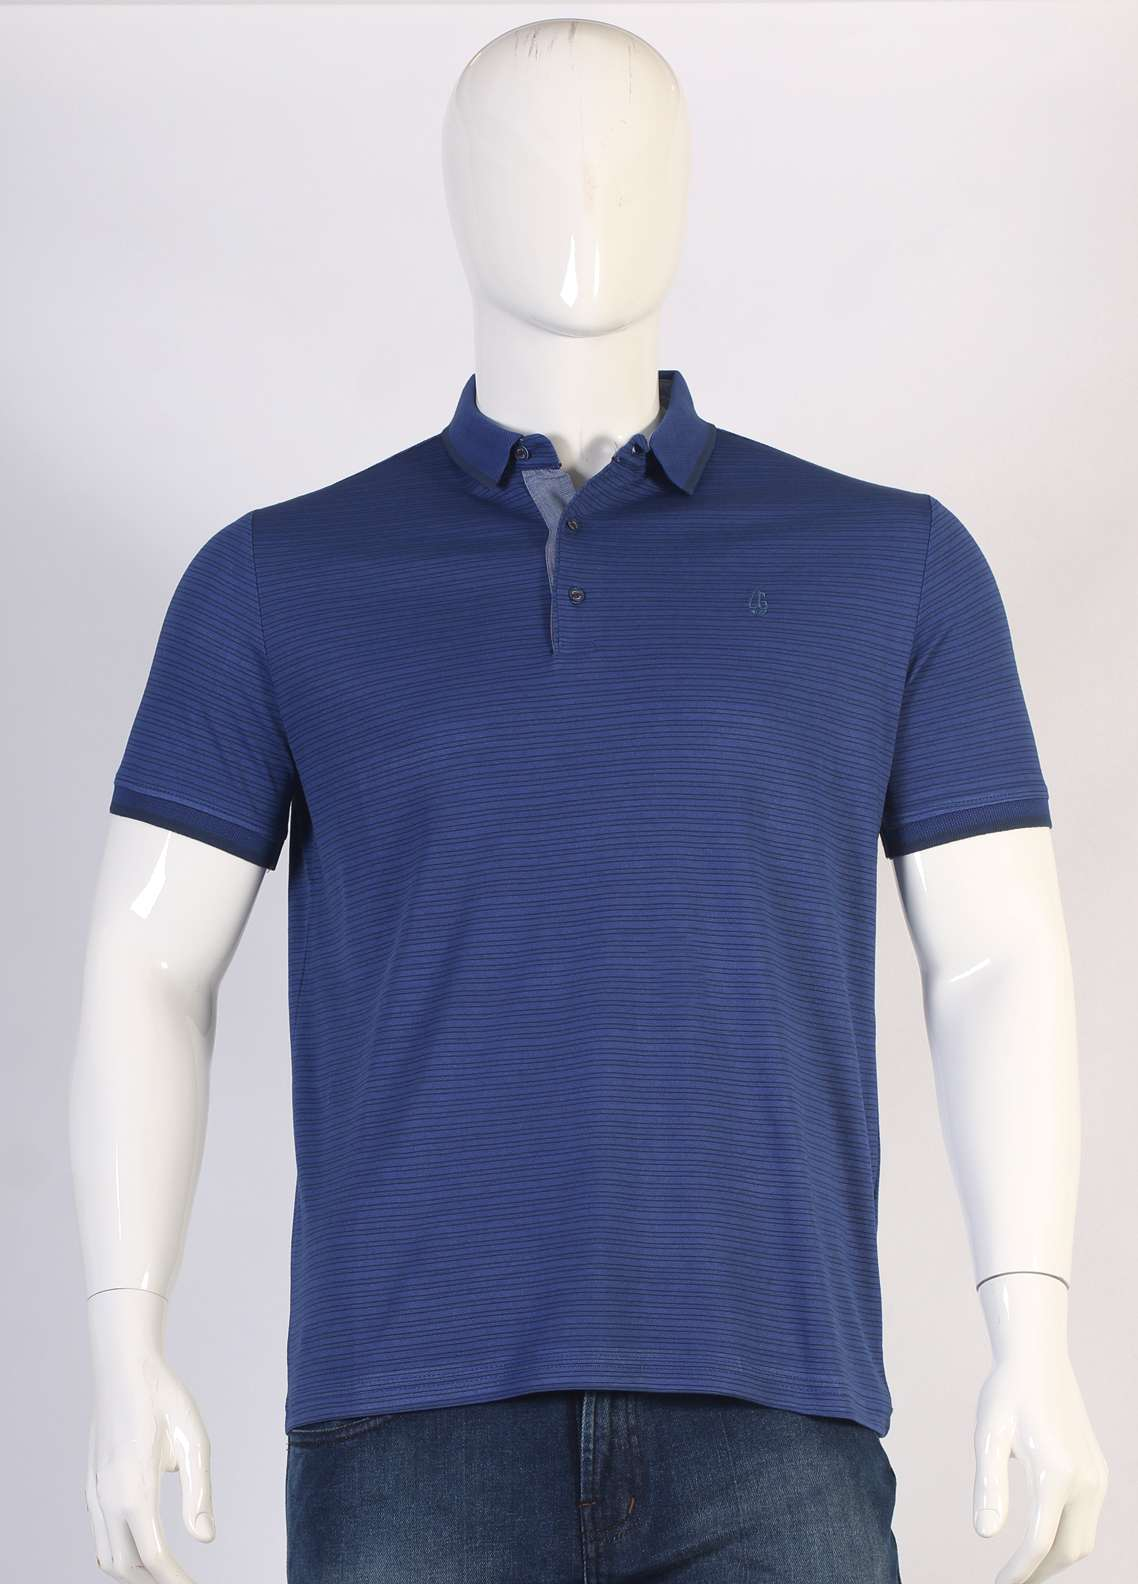 Sanaulla Exclusive Range Jersey Polo Men T-Shirts - Blue TKM18S 361-09